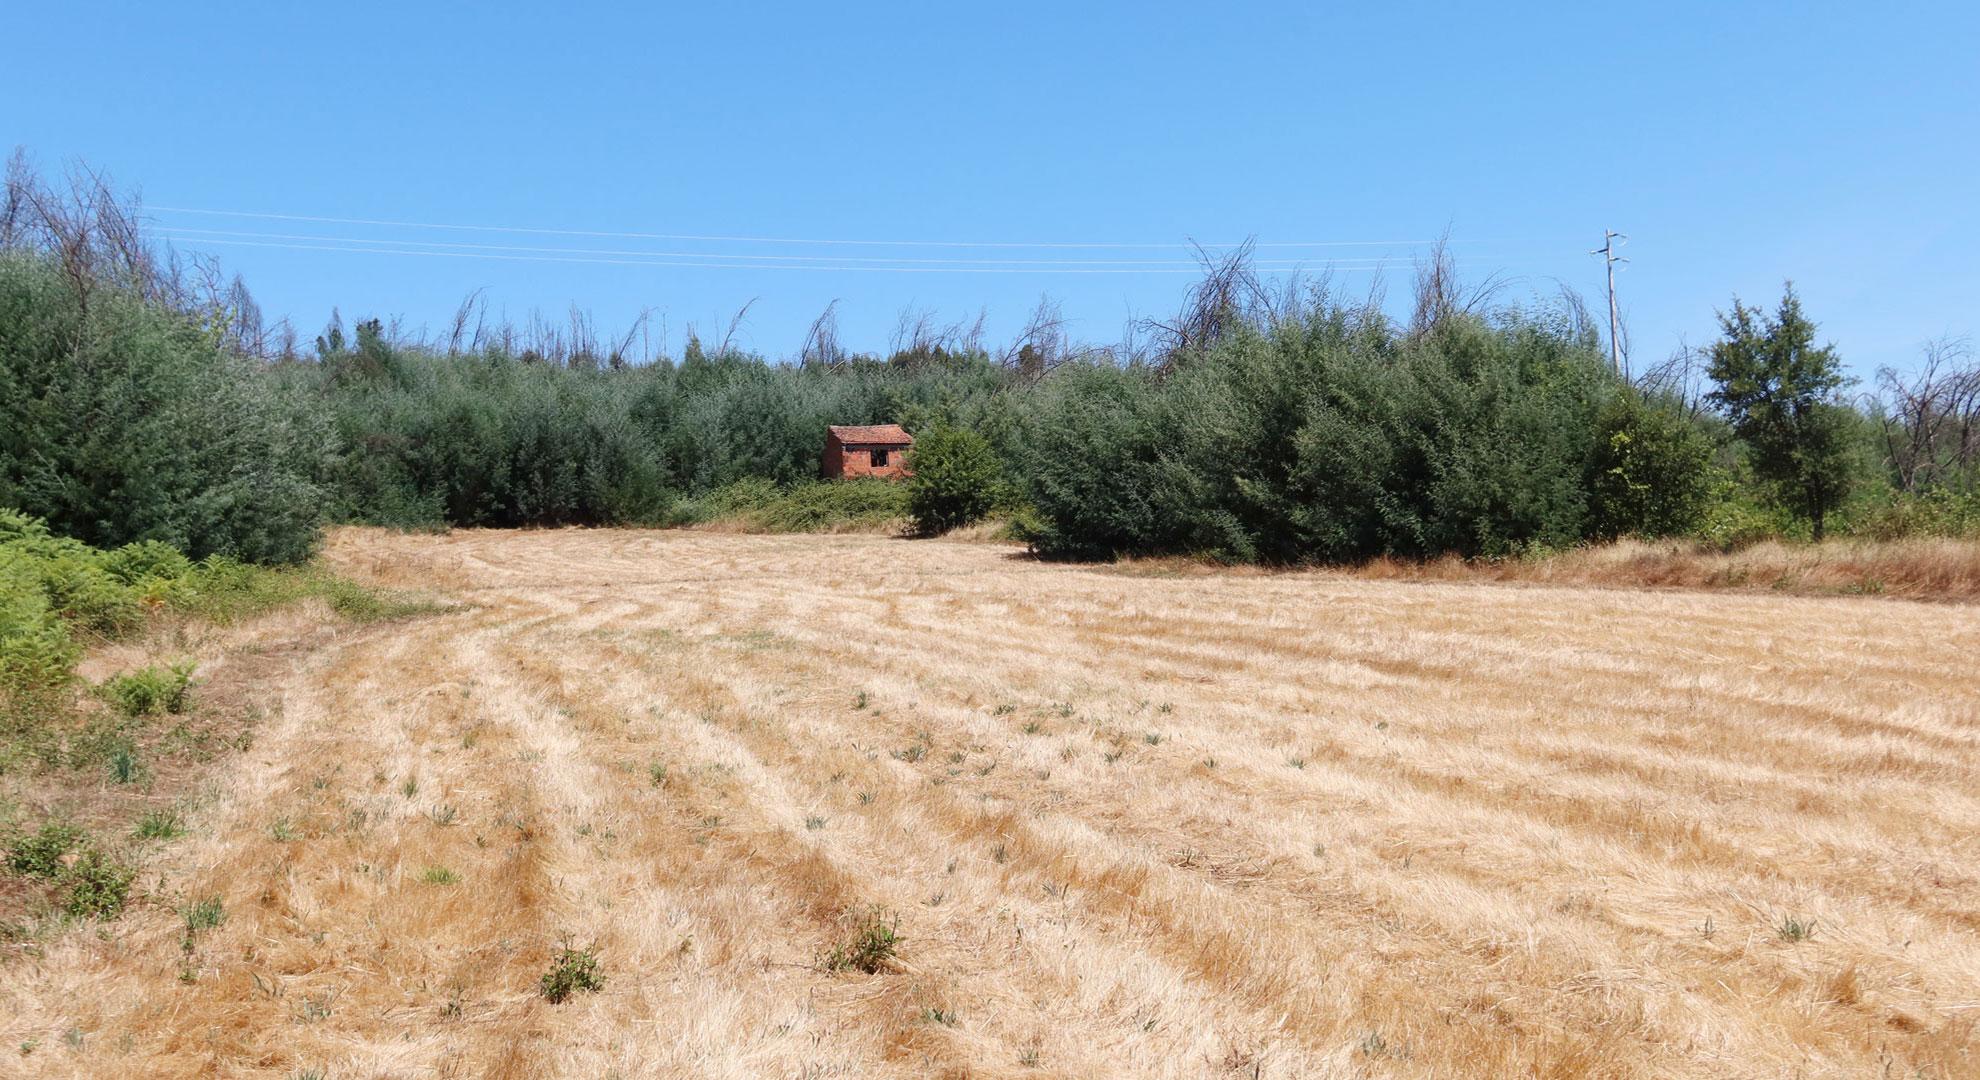 Big field from Project Kamp